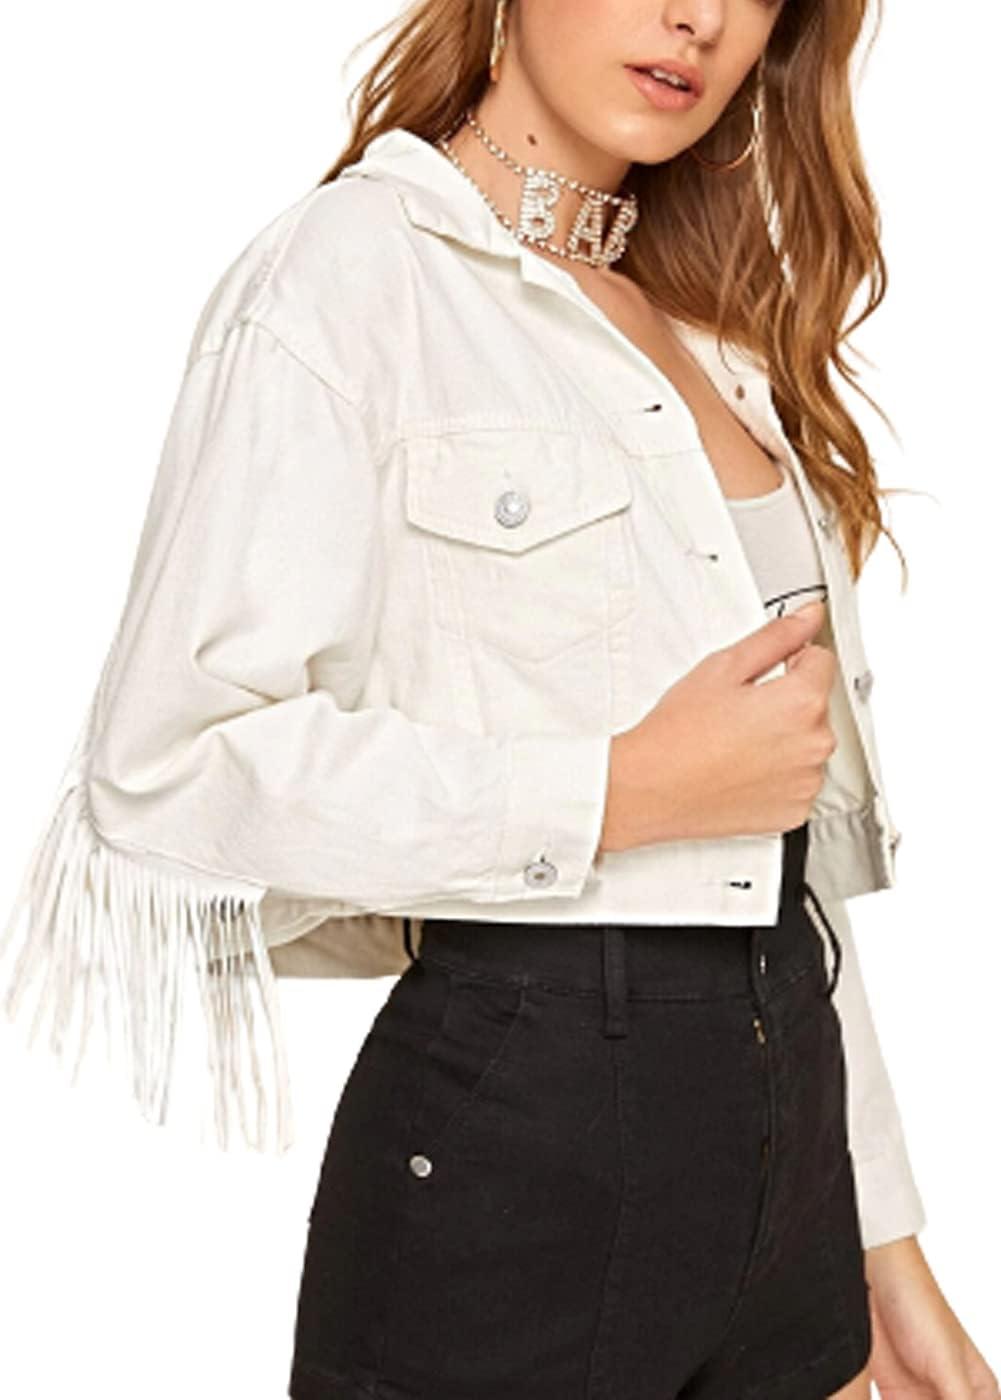 WanXingLiHe Women's Fringe Frayed Short Denim Jacket, Lapel Loose Fashion Casual Outerwear Jacket Jean,White,S